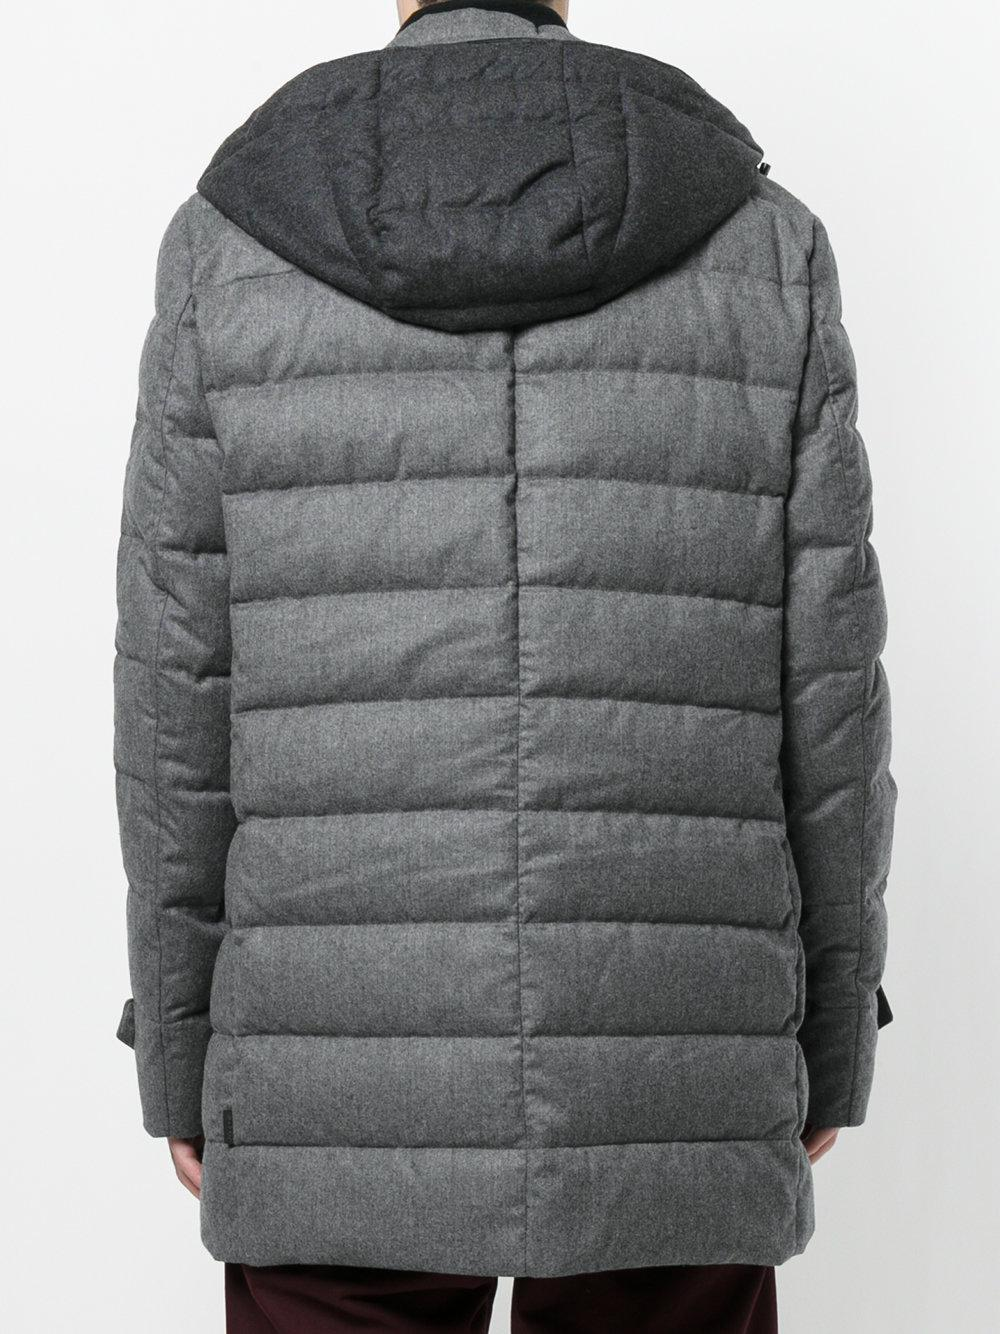 cfcc6783c21 Moncler Nicloux Coat in Gray for Men - Lyst